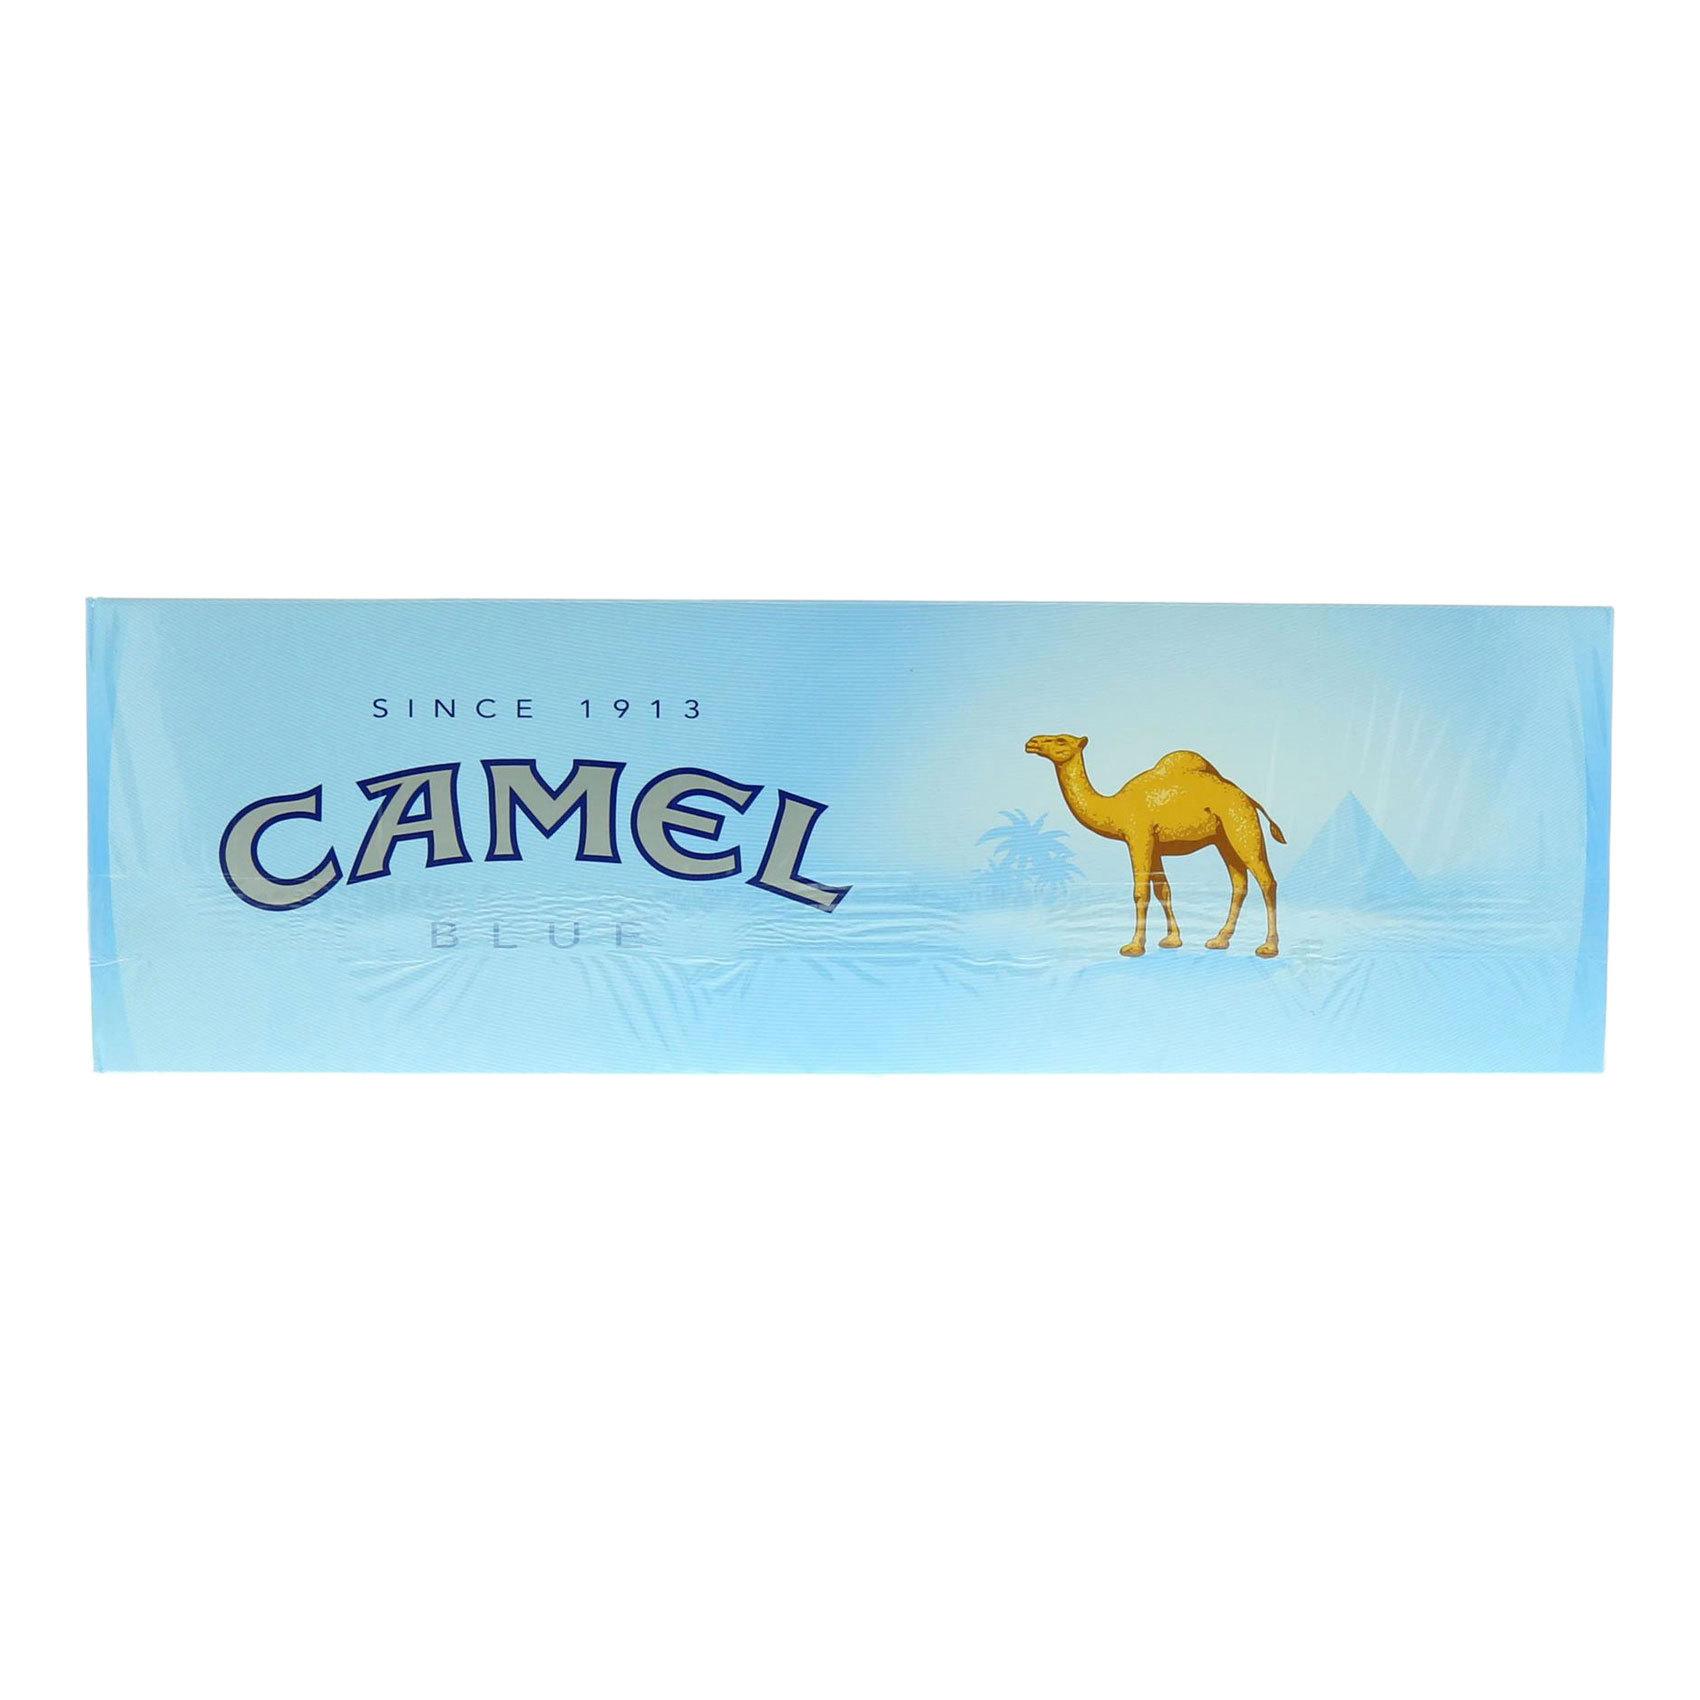 CAMEL BLUE KING SIZE 20X10